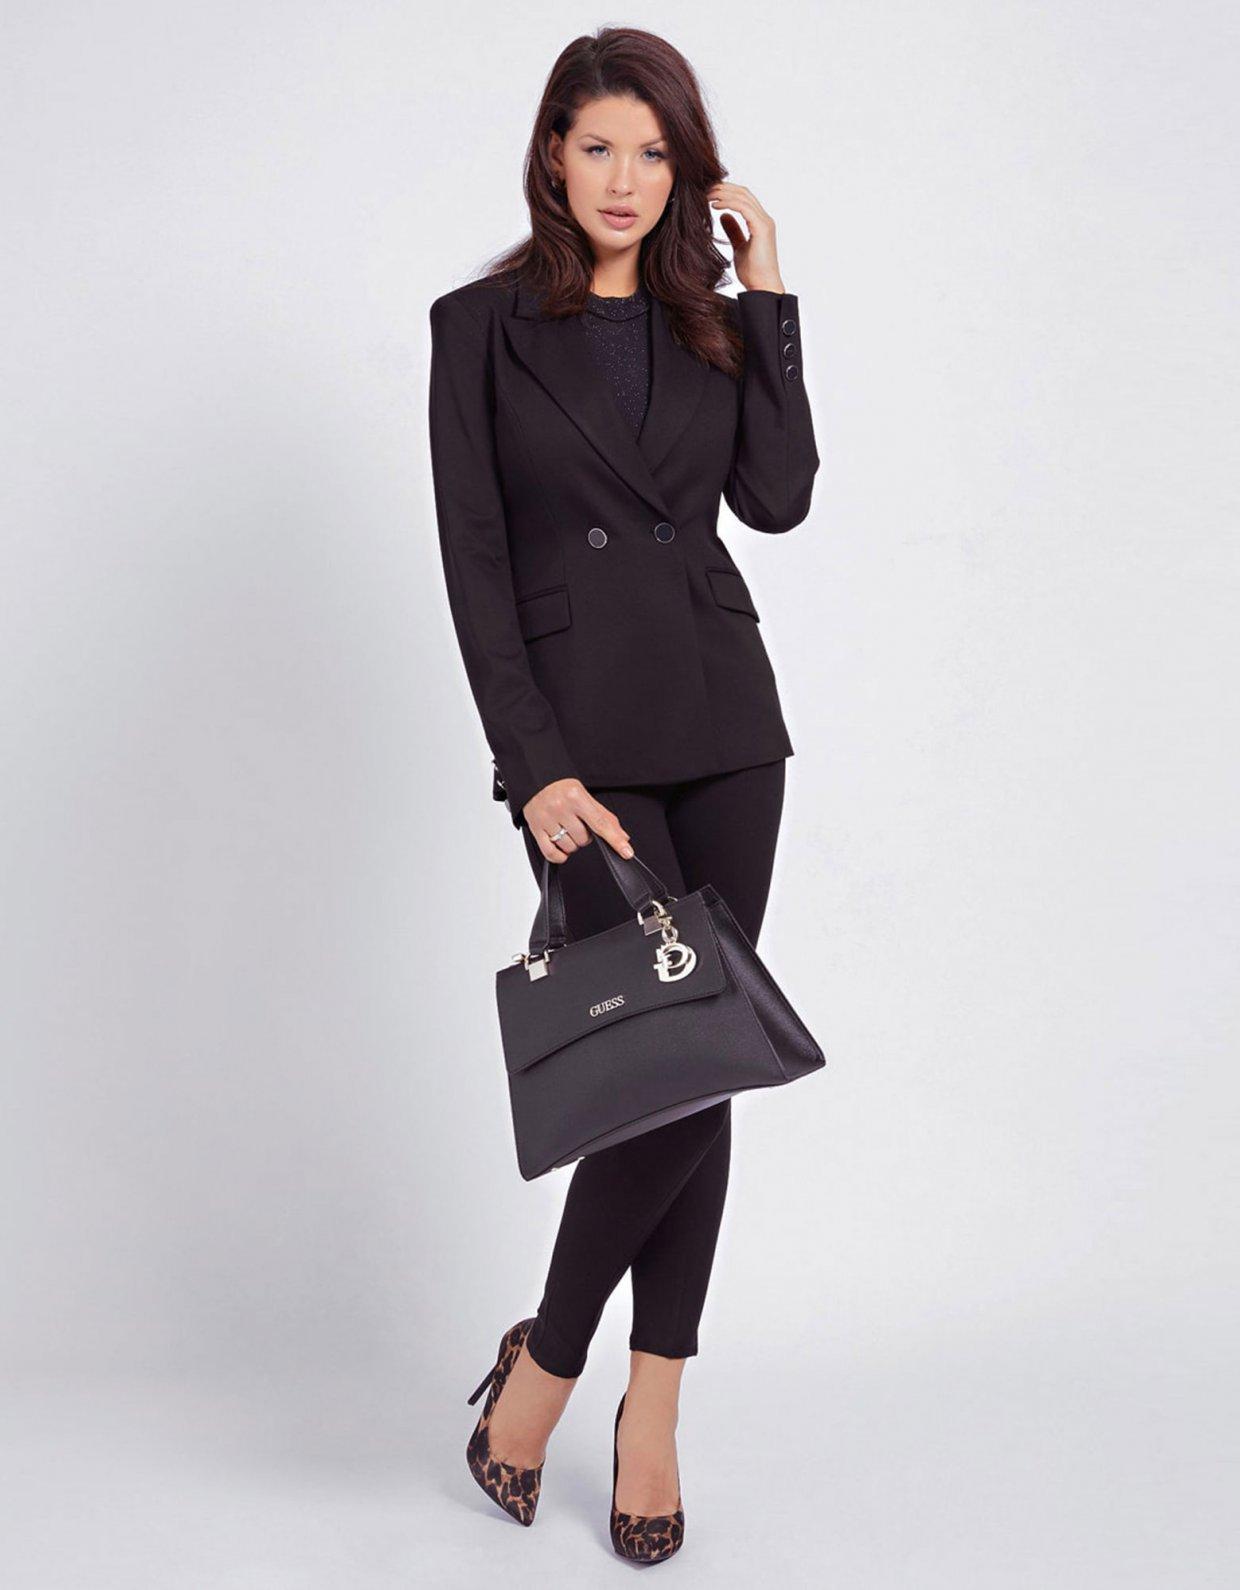 Guess Dalma girlfriend satchel handbag black